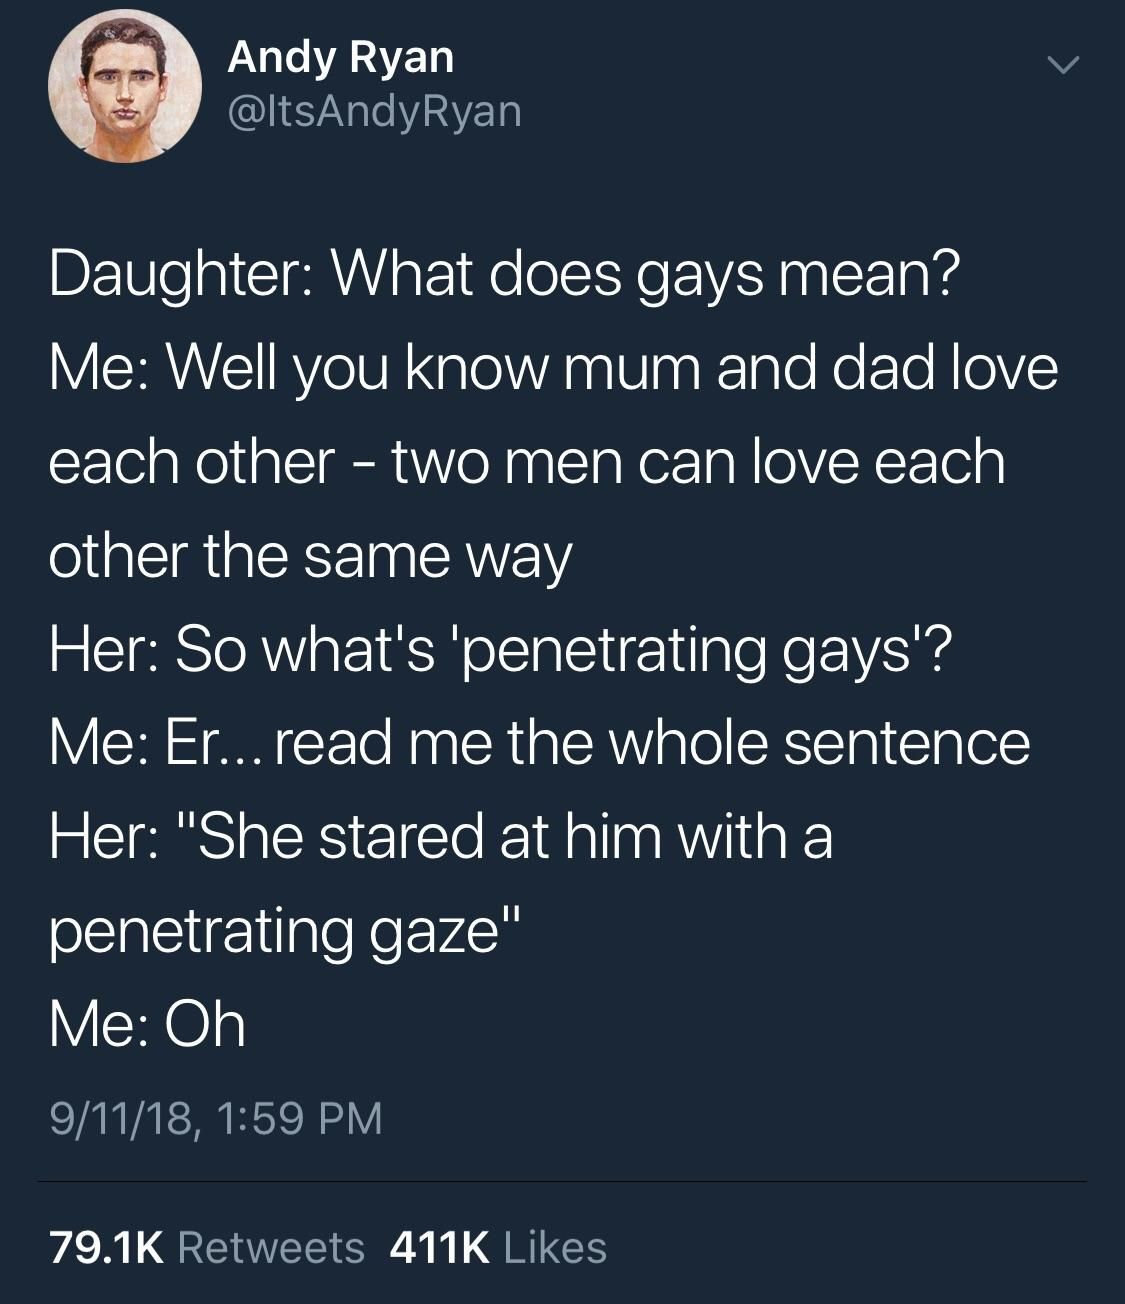 Penetrating Gays